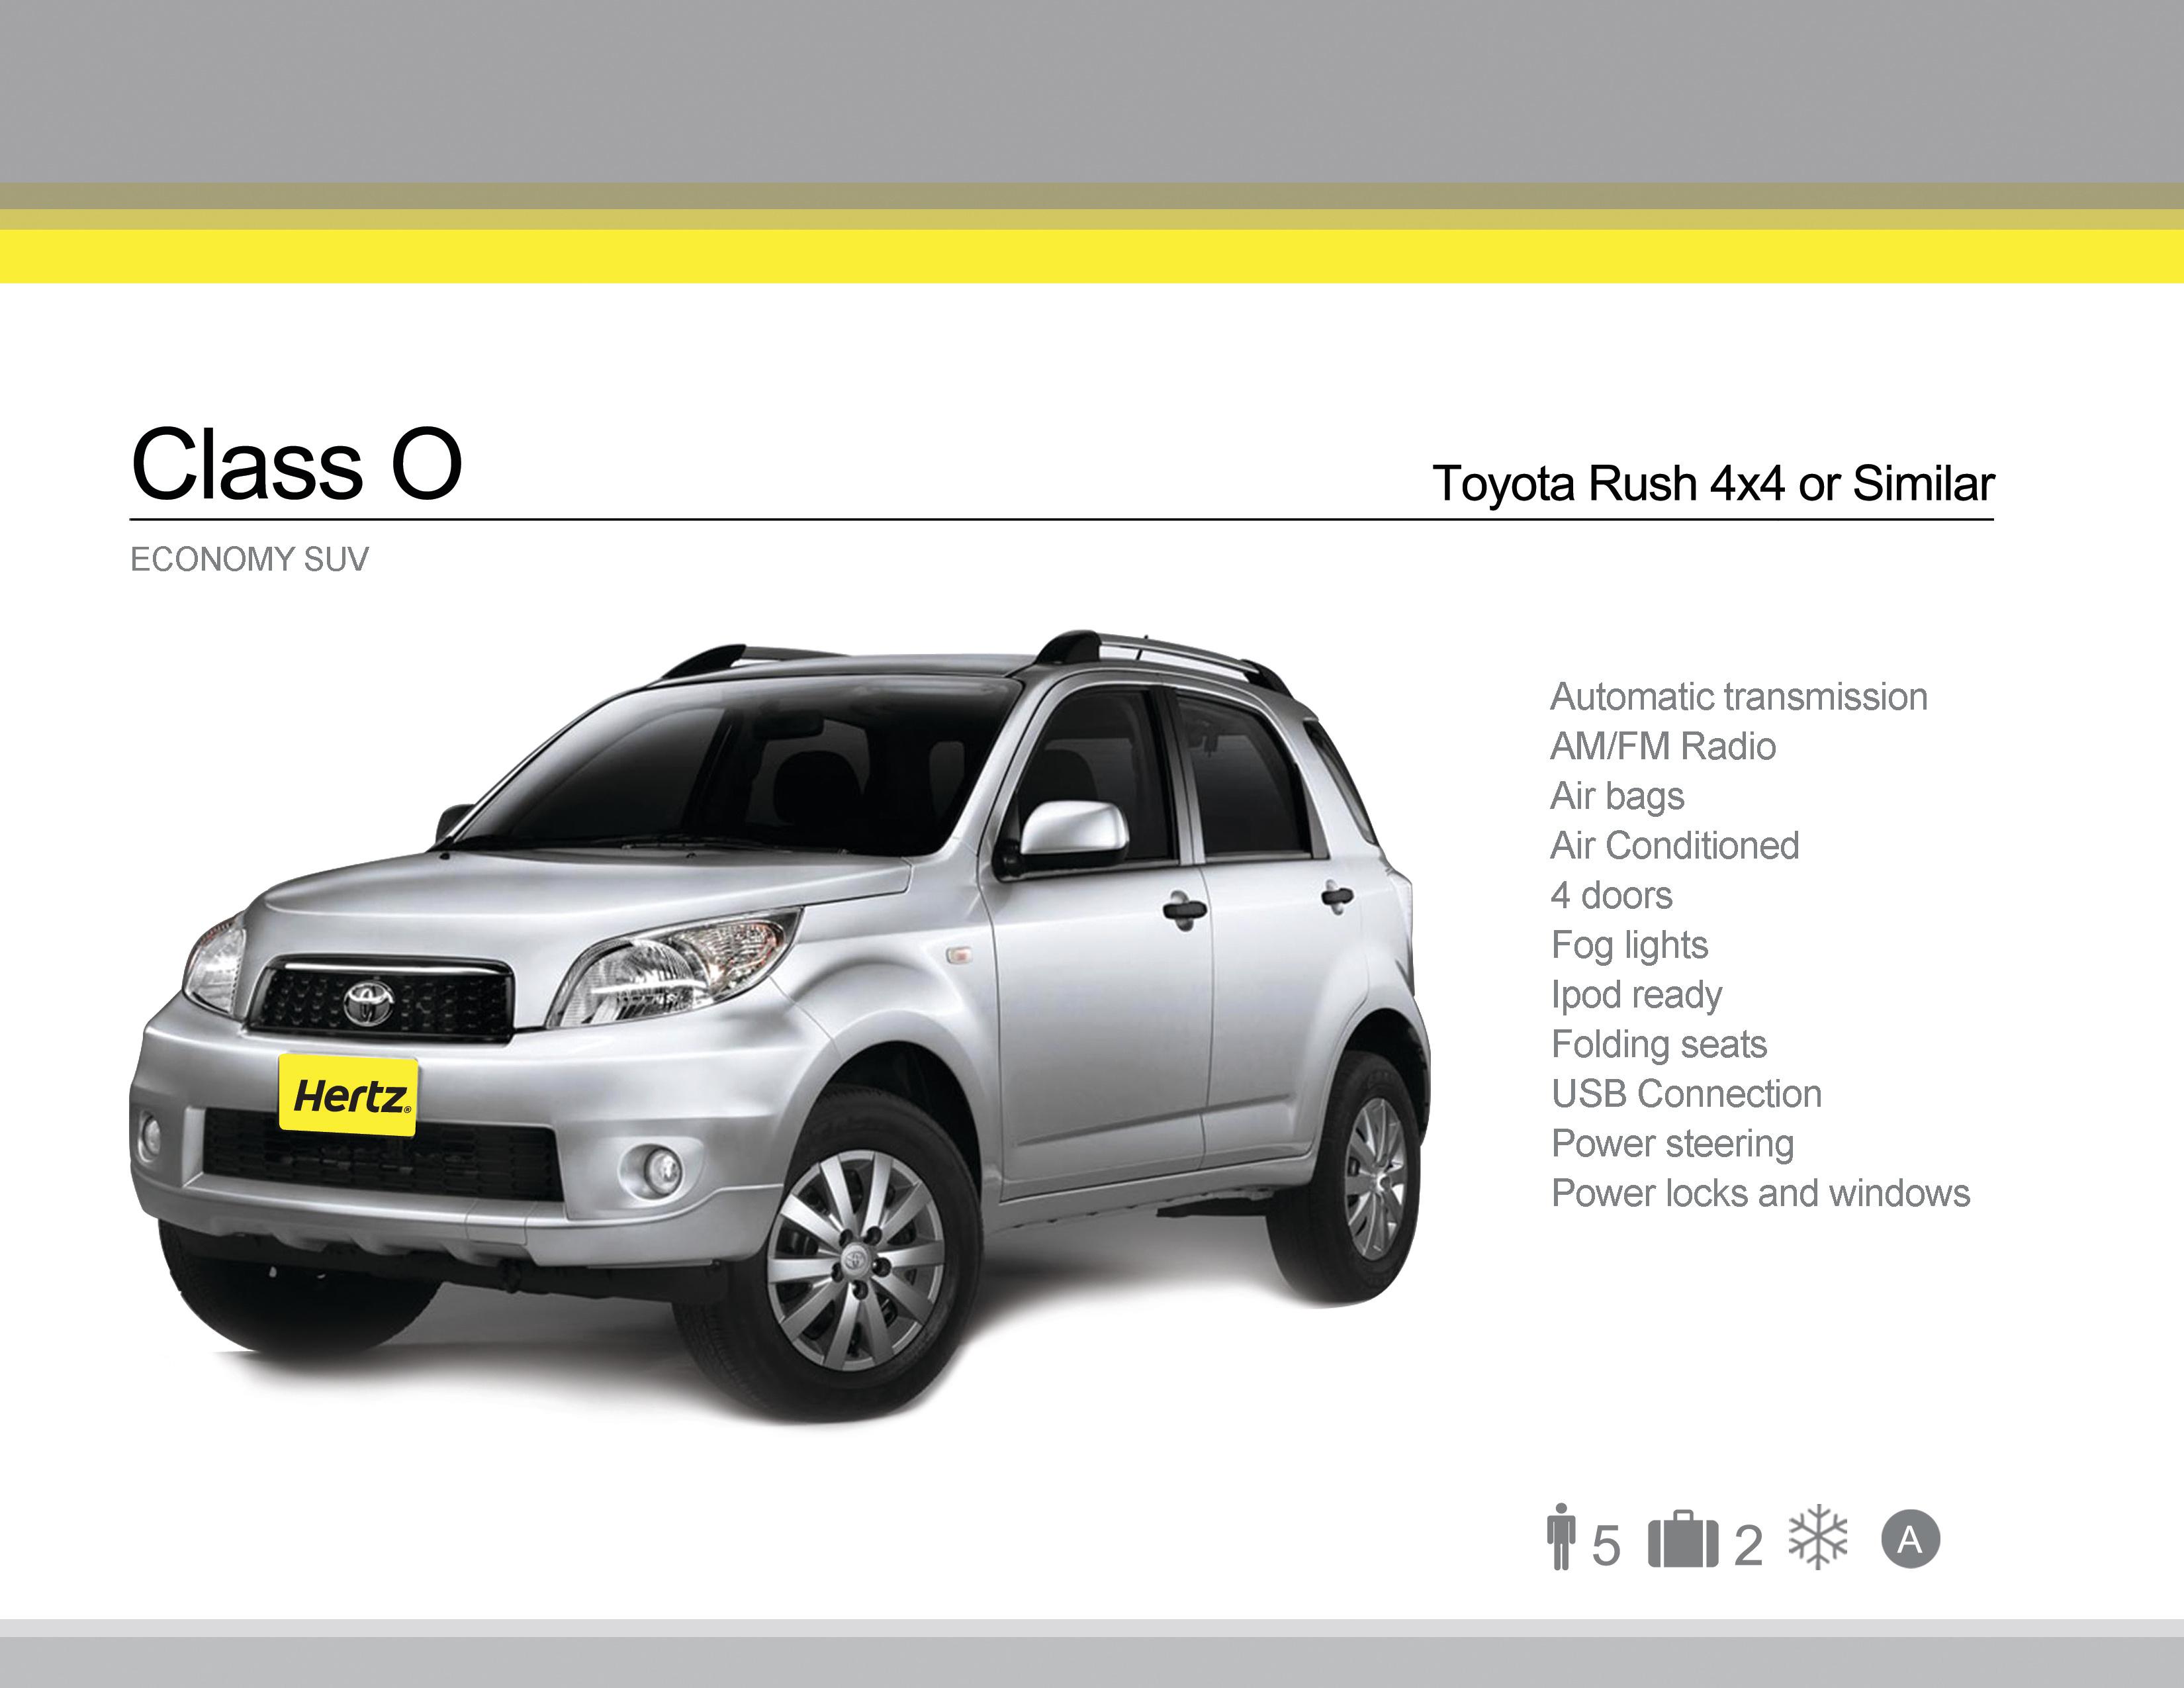 Class O - Toyota Rush or Similar